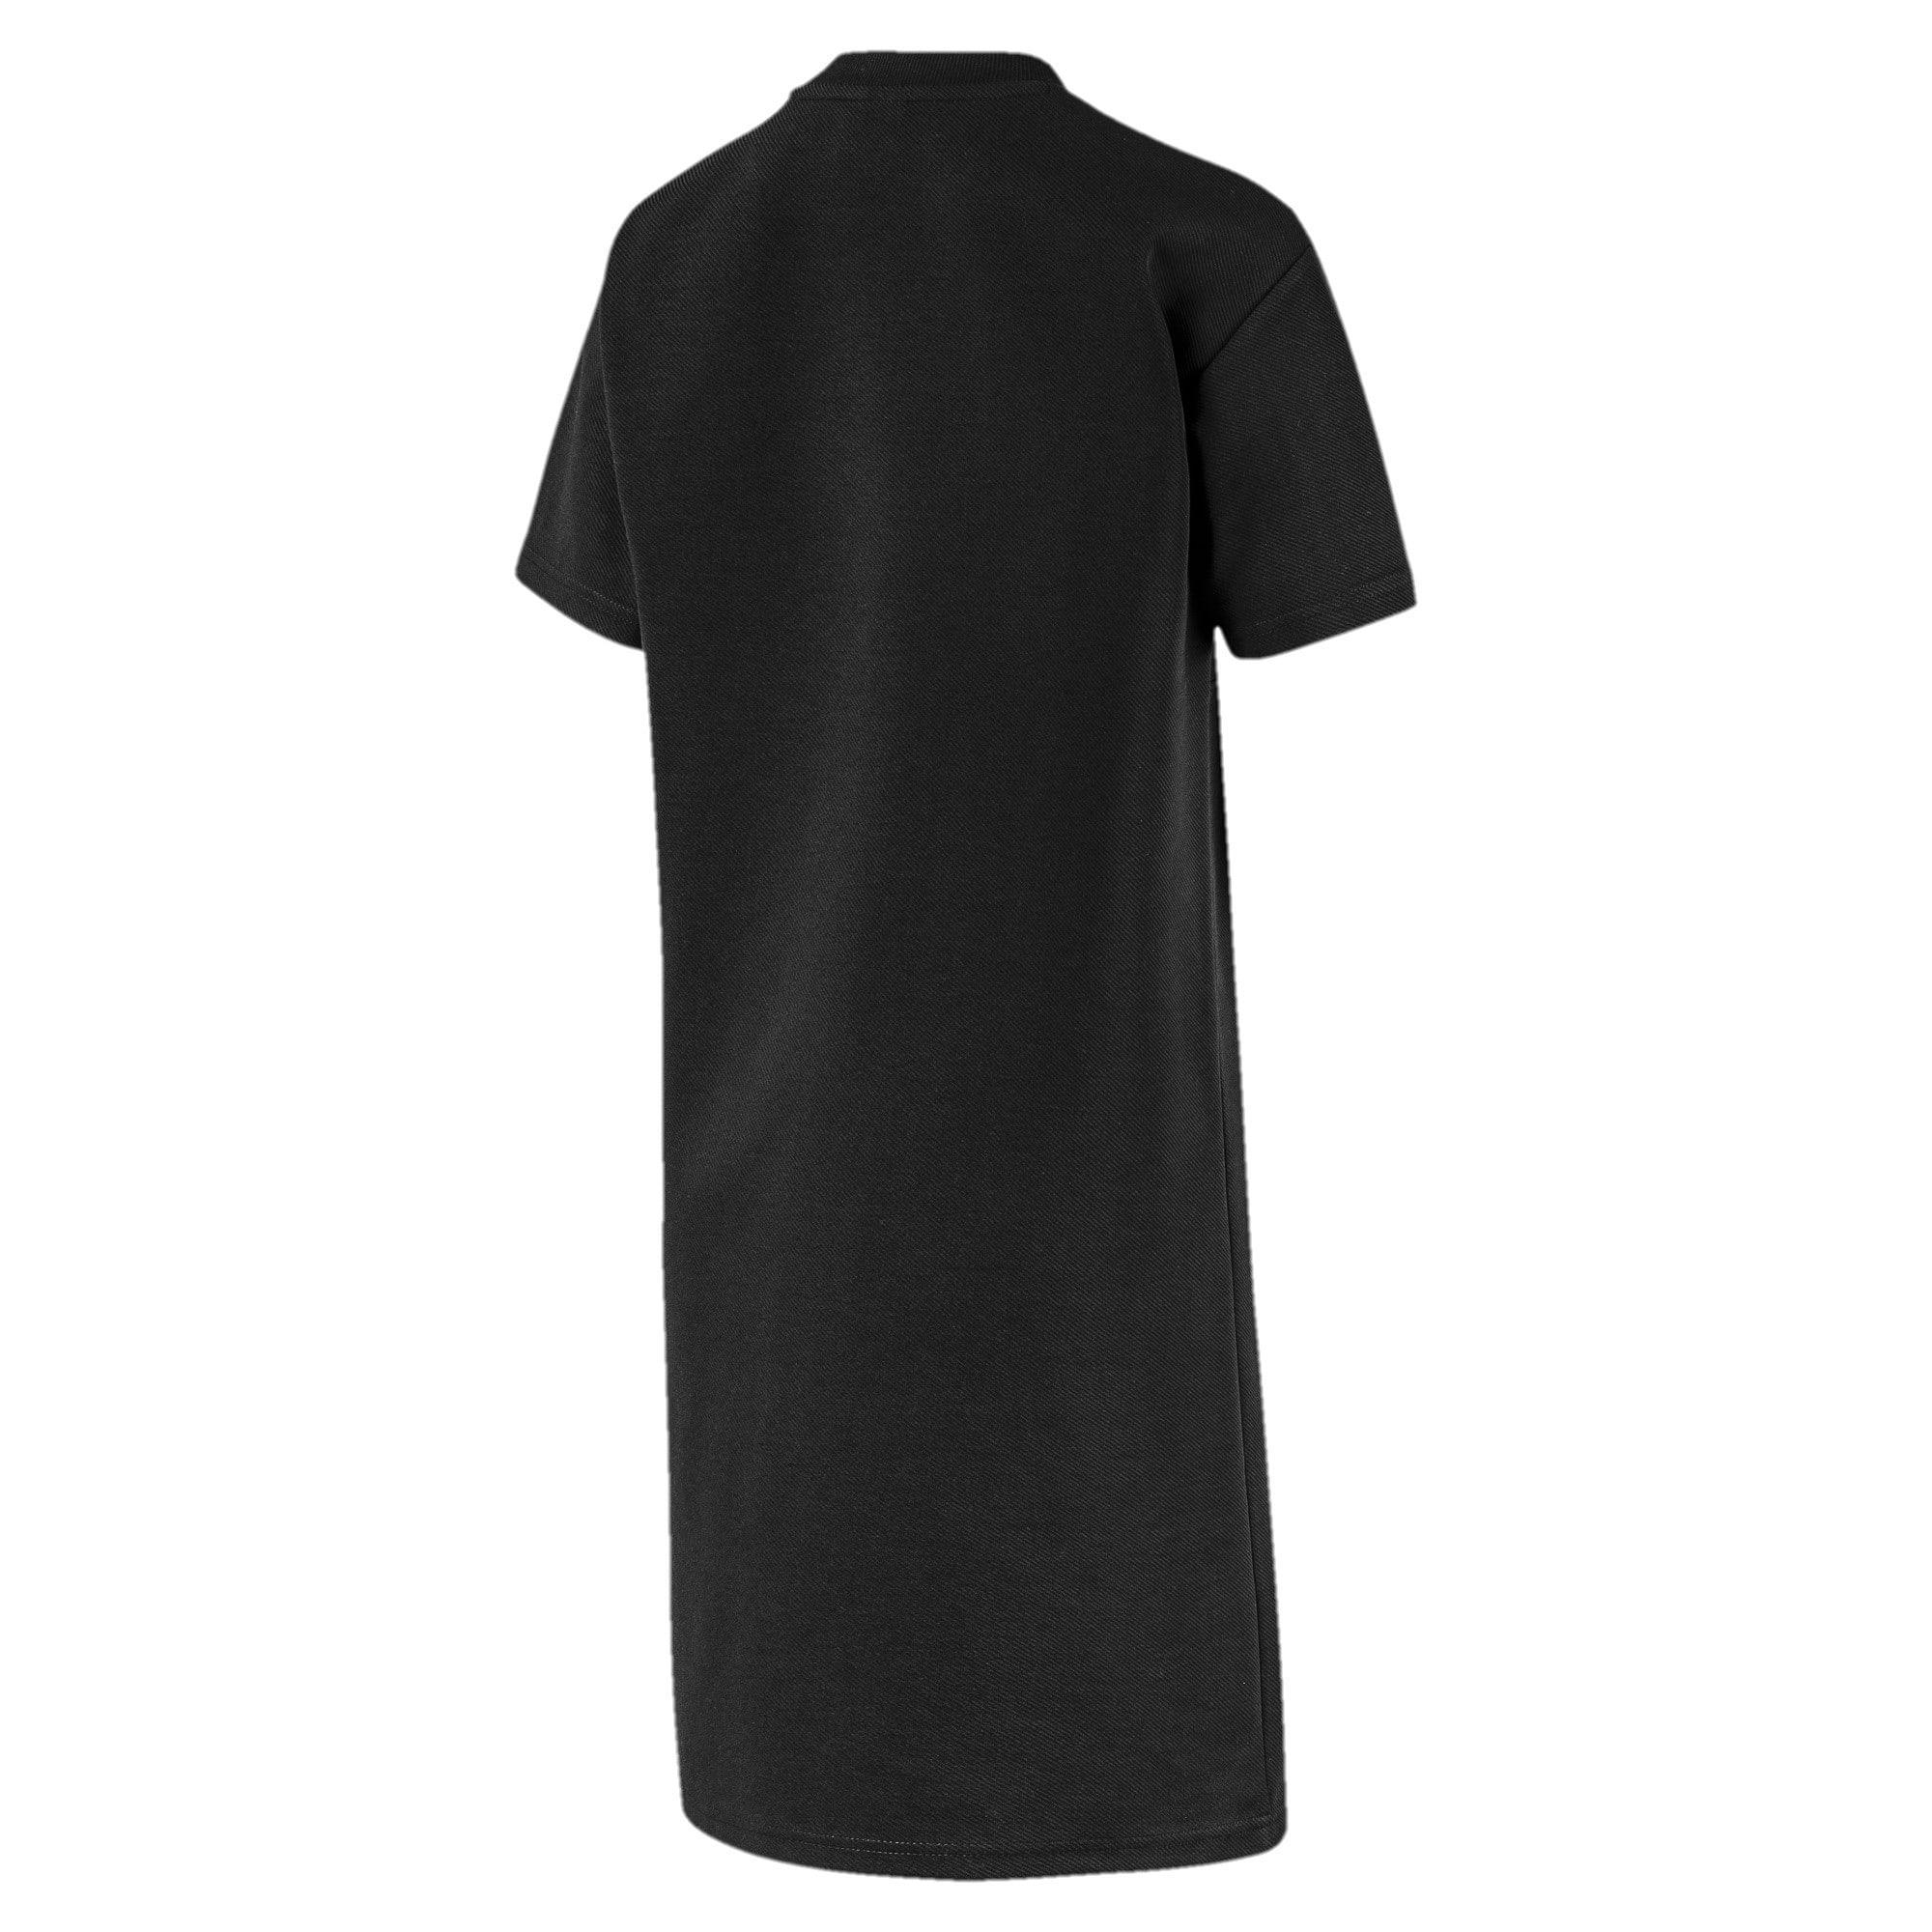 Anteprima 5 di Downtown Women's Dress, Puma Black, medio